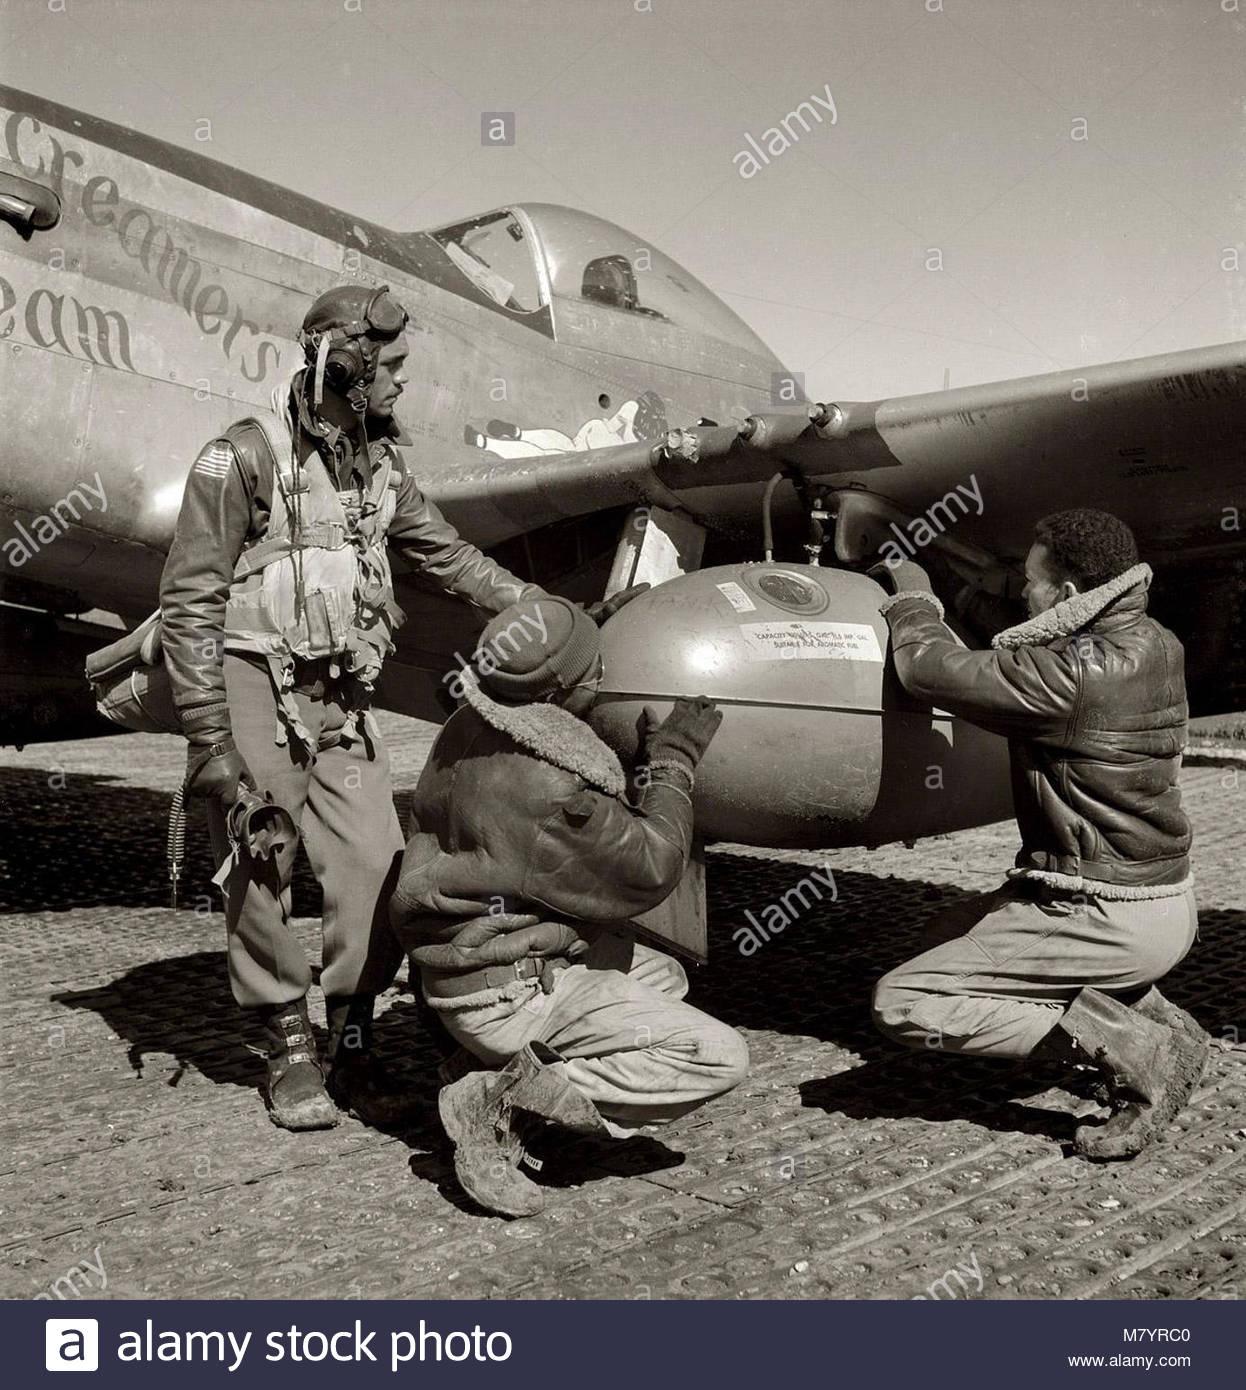 Pilotes Tuskegee Edward C Gleed avec le North American P-51. Photo Stock